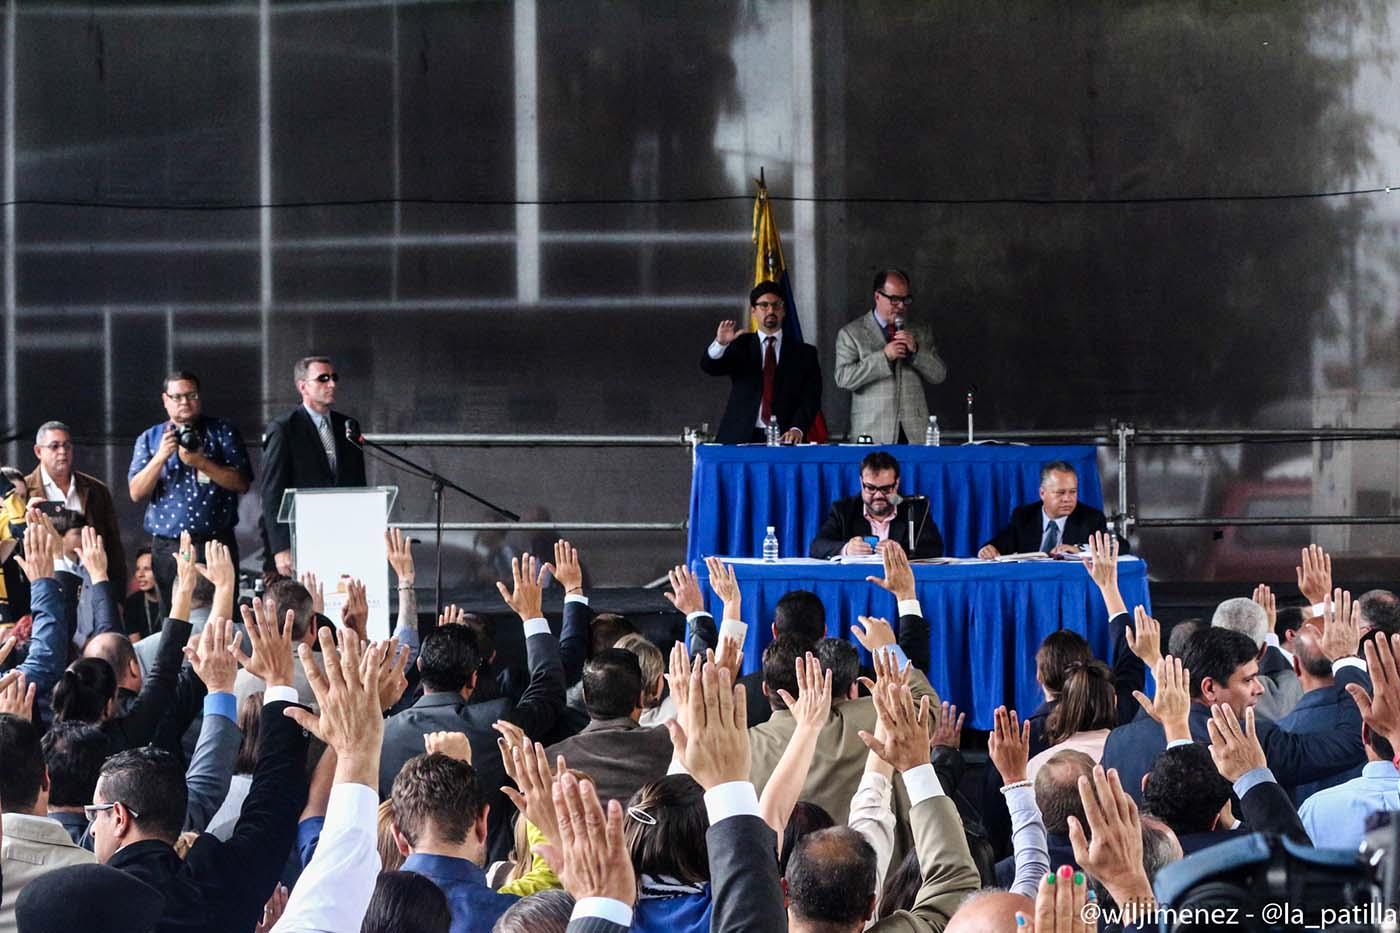 La Asamblea Nacional juramentó a los nuevos magistrados del TSJ (Foto lapatilla)